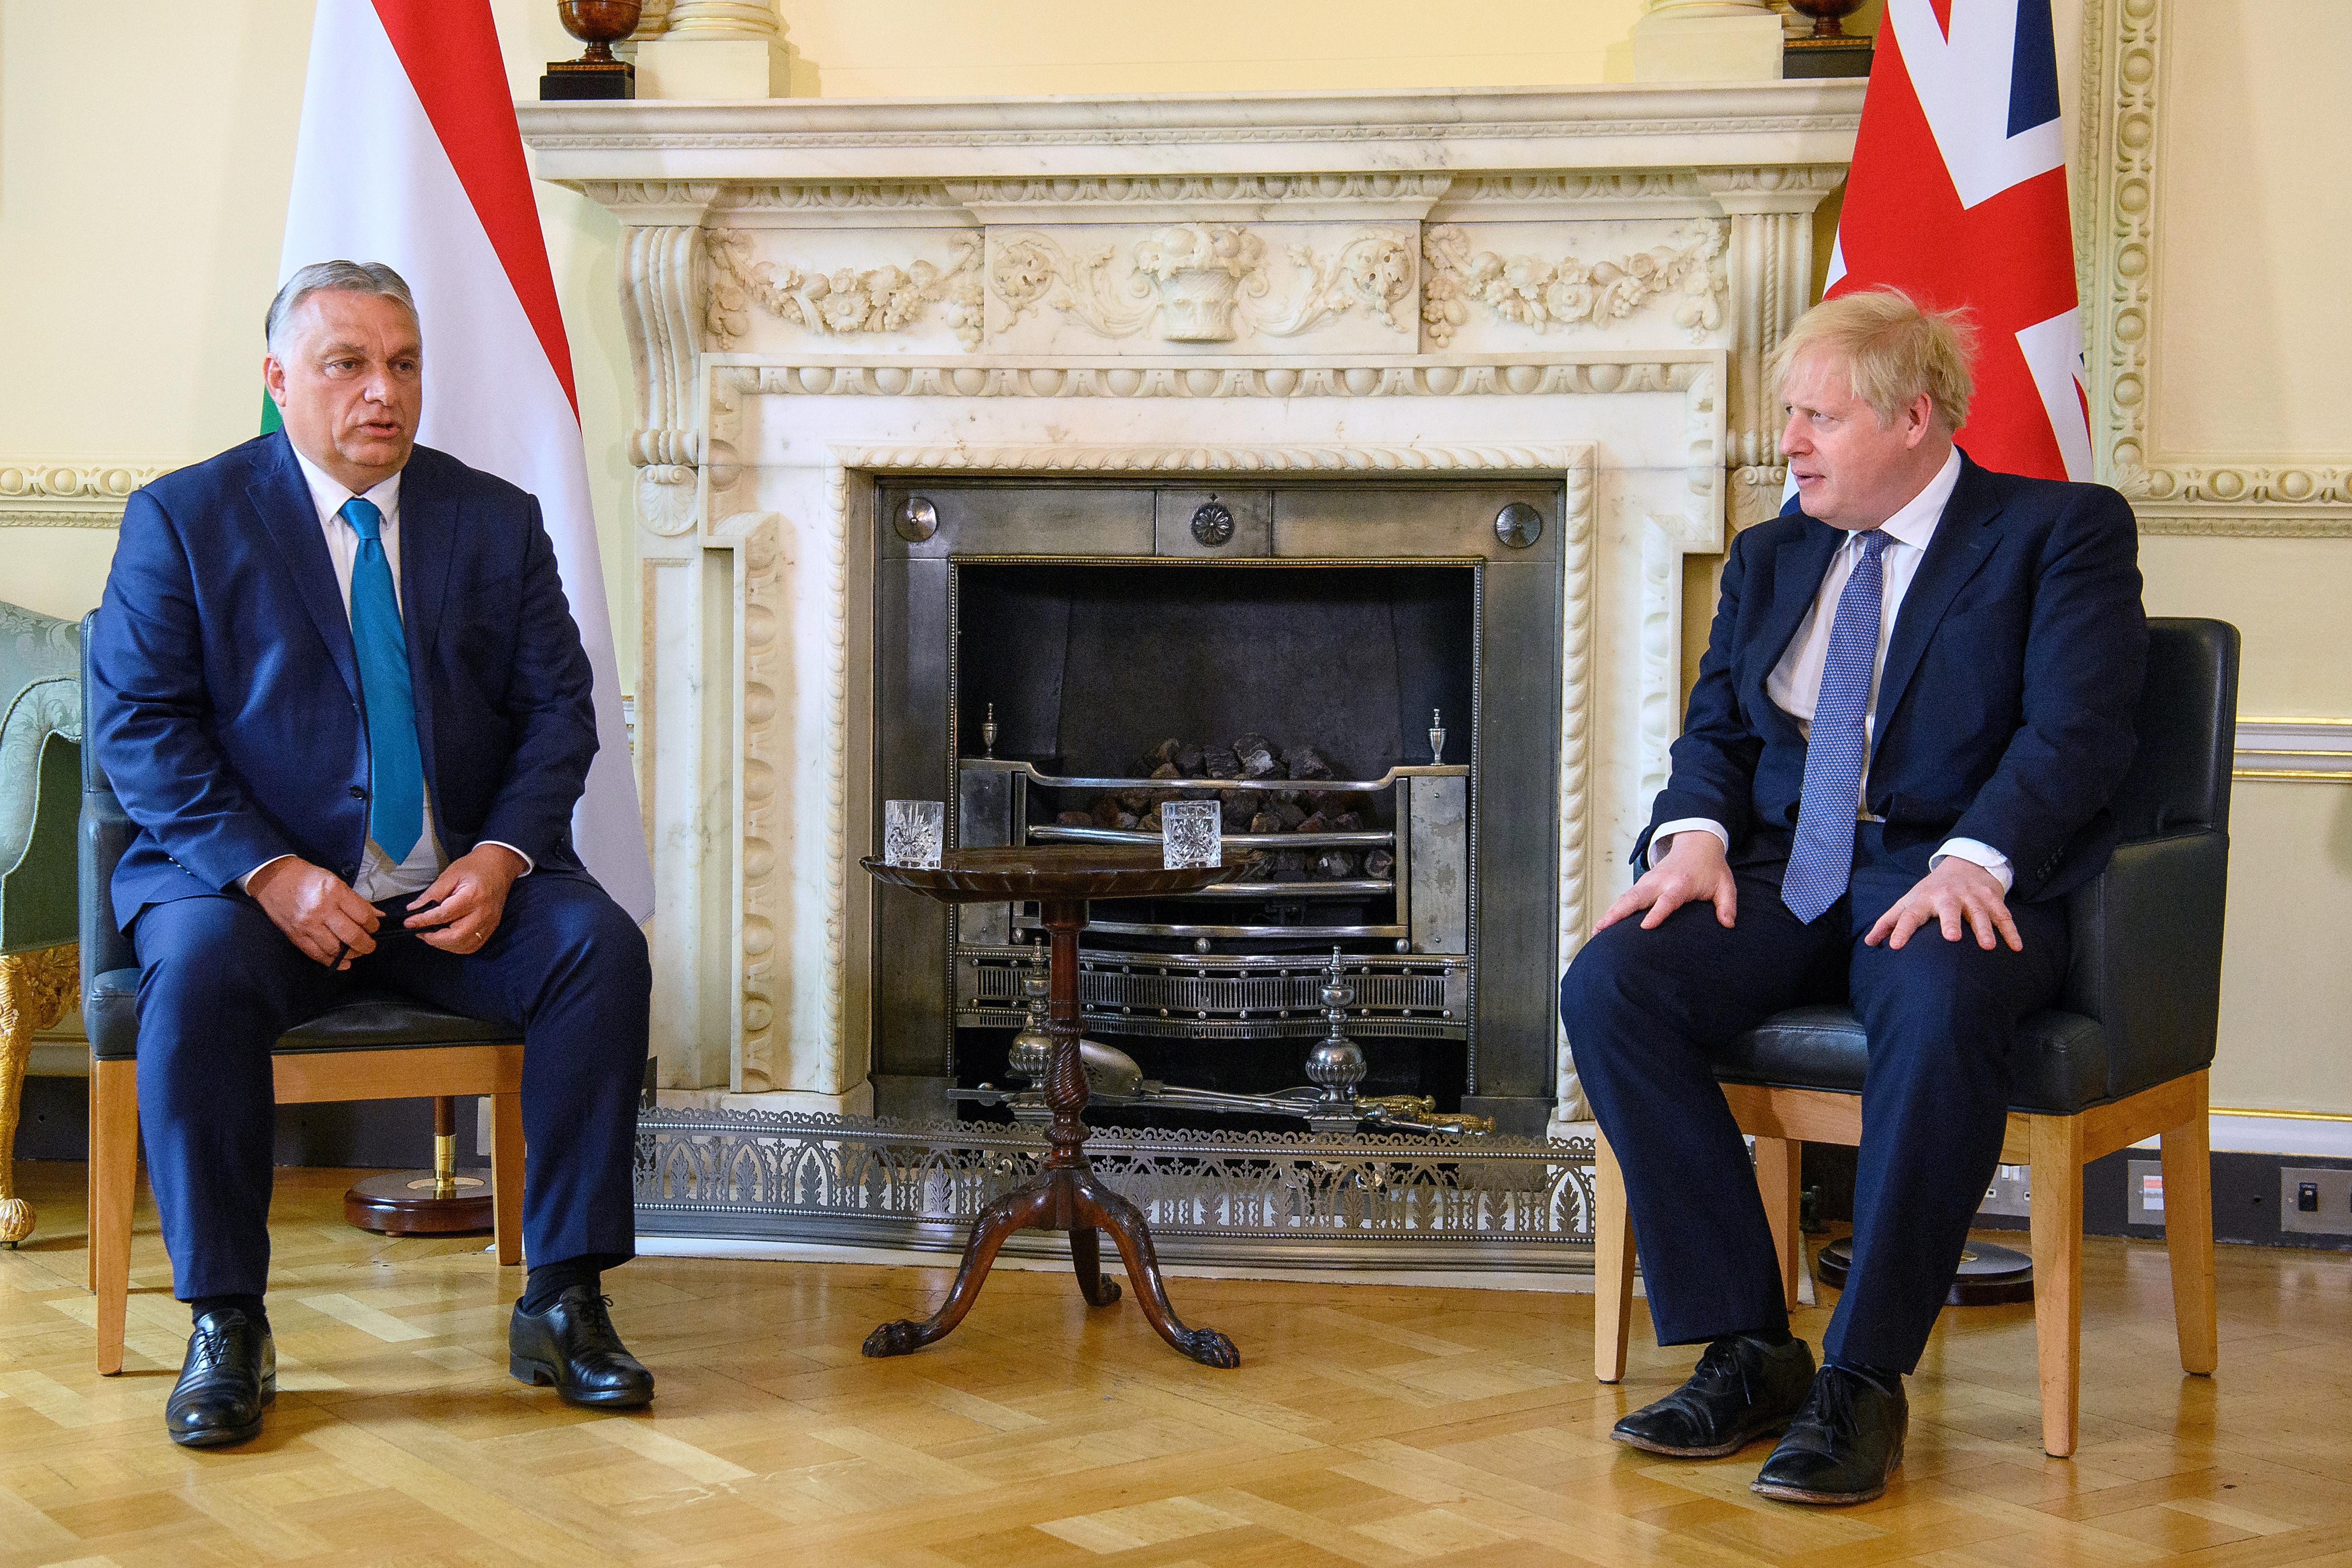 British Prime Minister Boris Johnson talks to Hungarian Prime Minister Viktor Orban at Downing Street in London, Britain May 28, 2021. Leon Neal/Pool via REUTERS